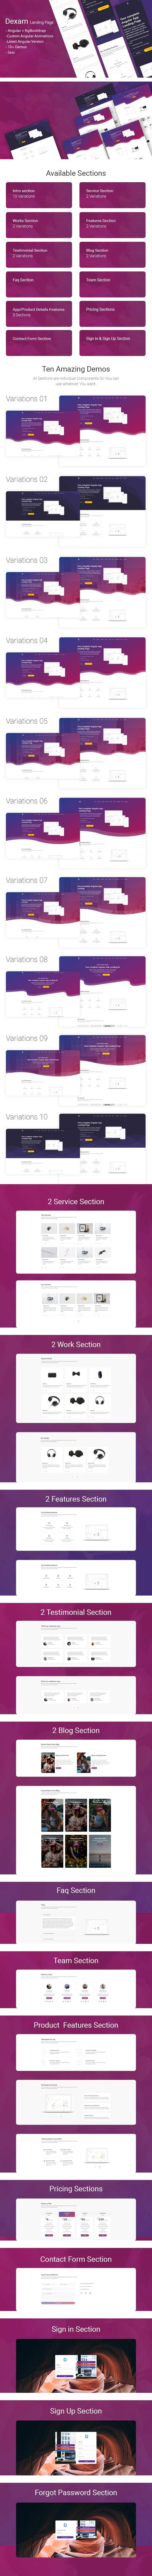 Dexam - Angular Bootstrap App Landing Page - 2